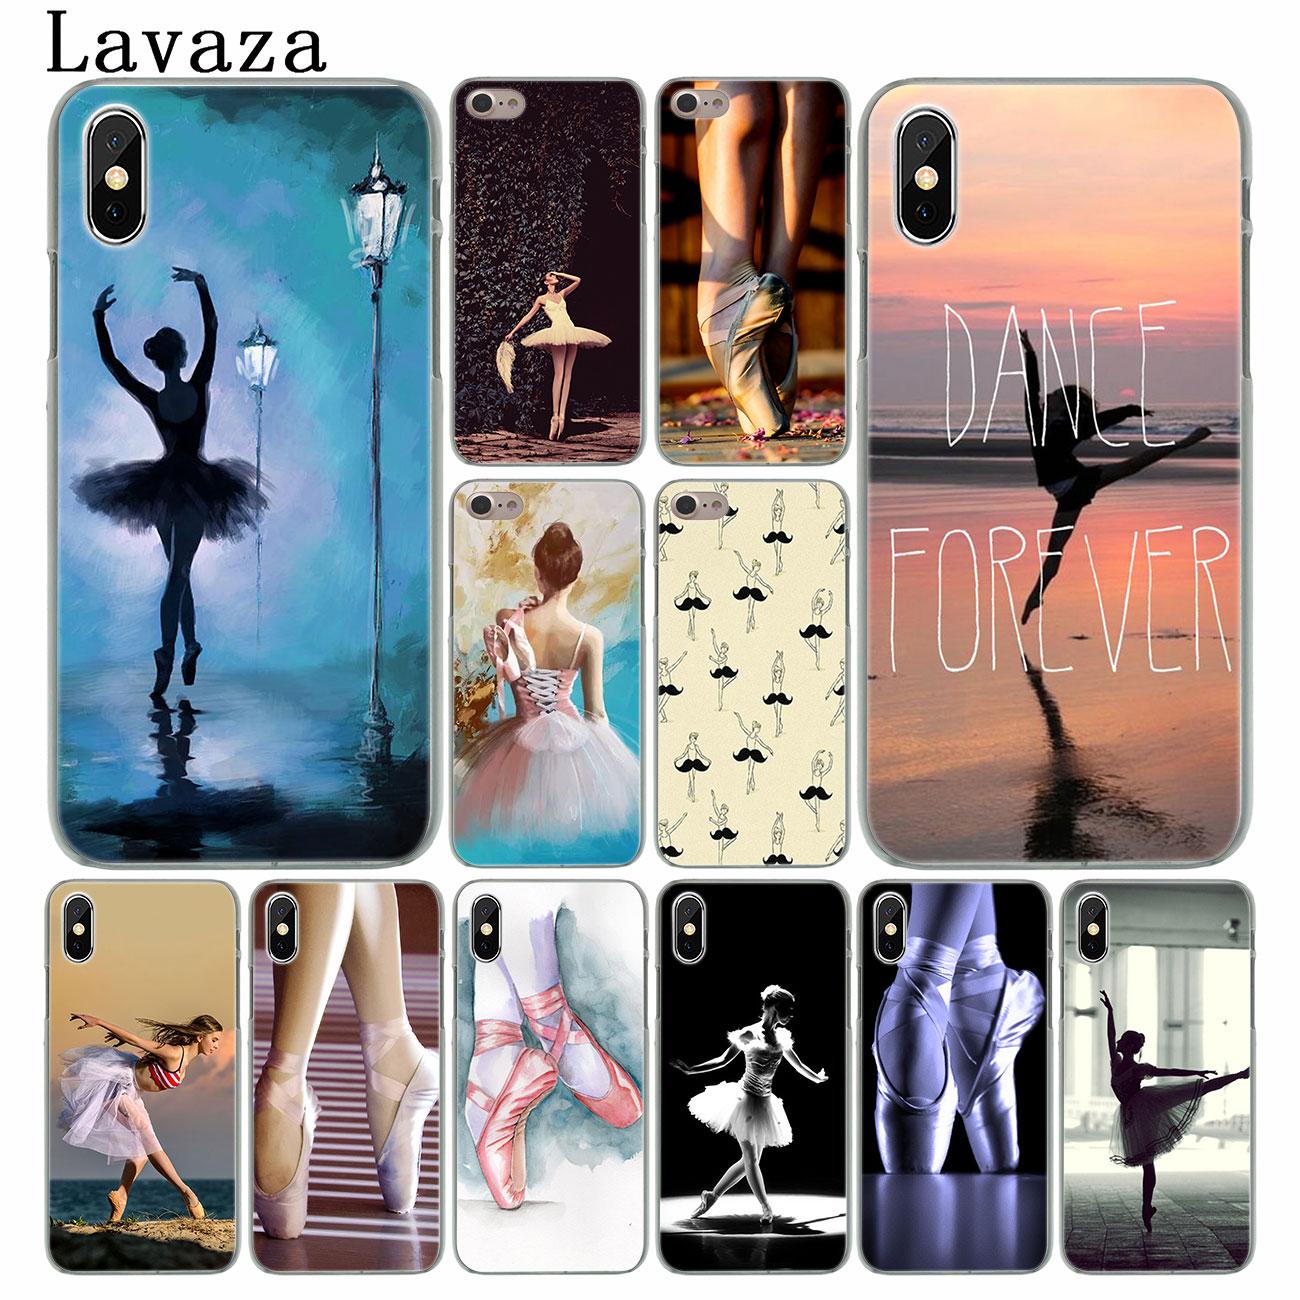 Lavaza chica bailar Ballet zapatillas Pointe zapatos teléfono caso duro para el iPhone XR X XS 11 Pro Max 10 7 8 6 6S 5 5 5S SE 4S 4